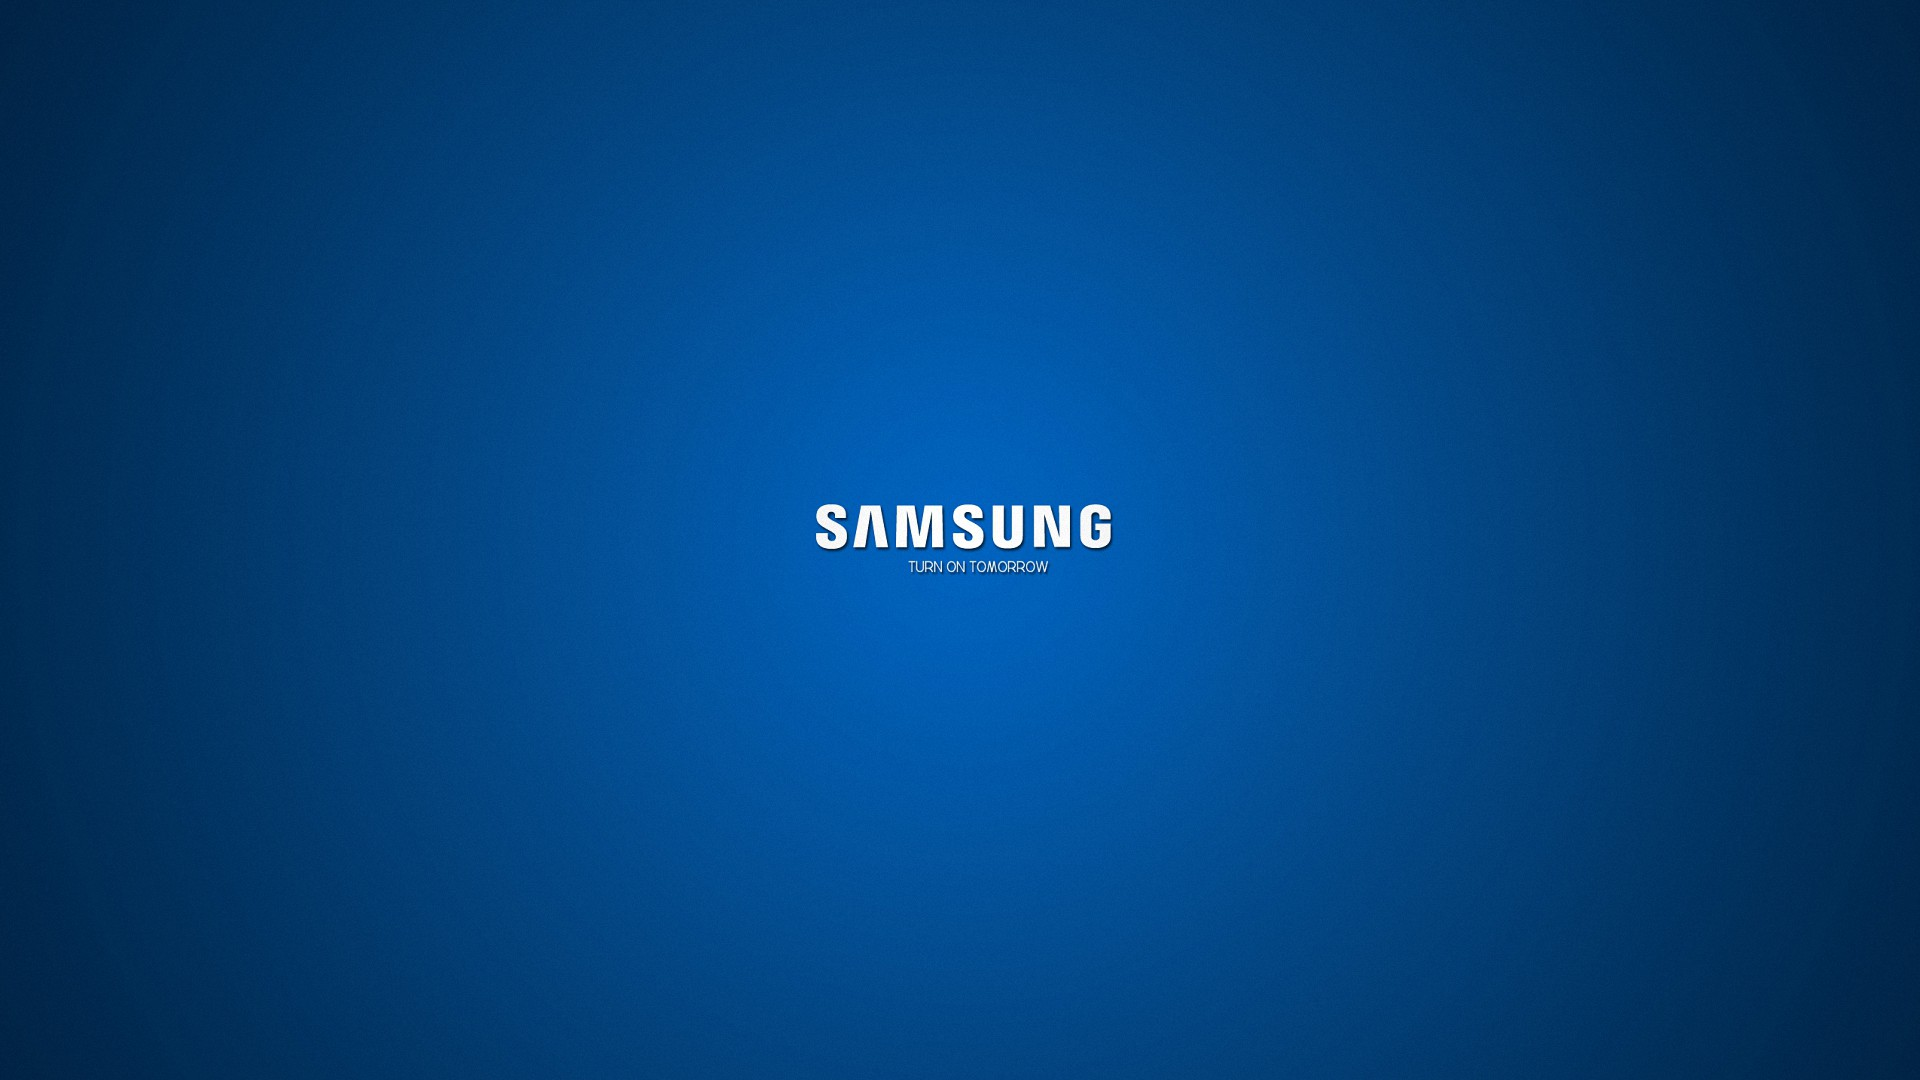 Samsung Wallpaper 1080p: Samsung Wallpaper 10